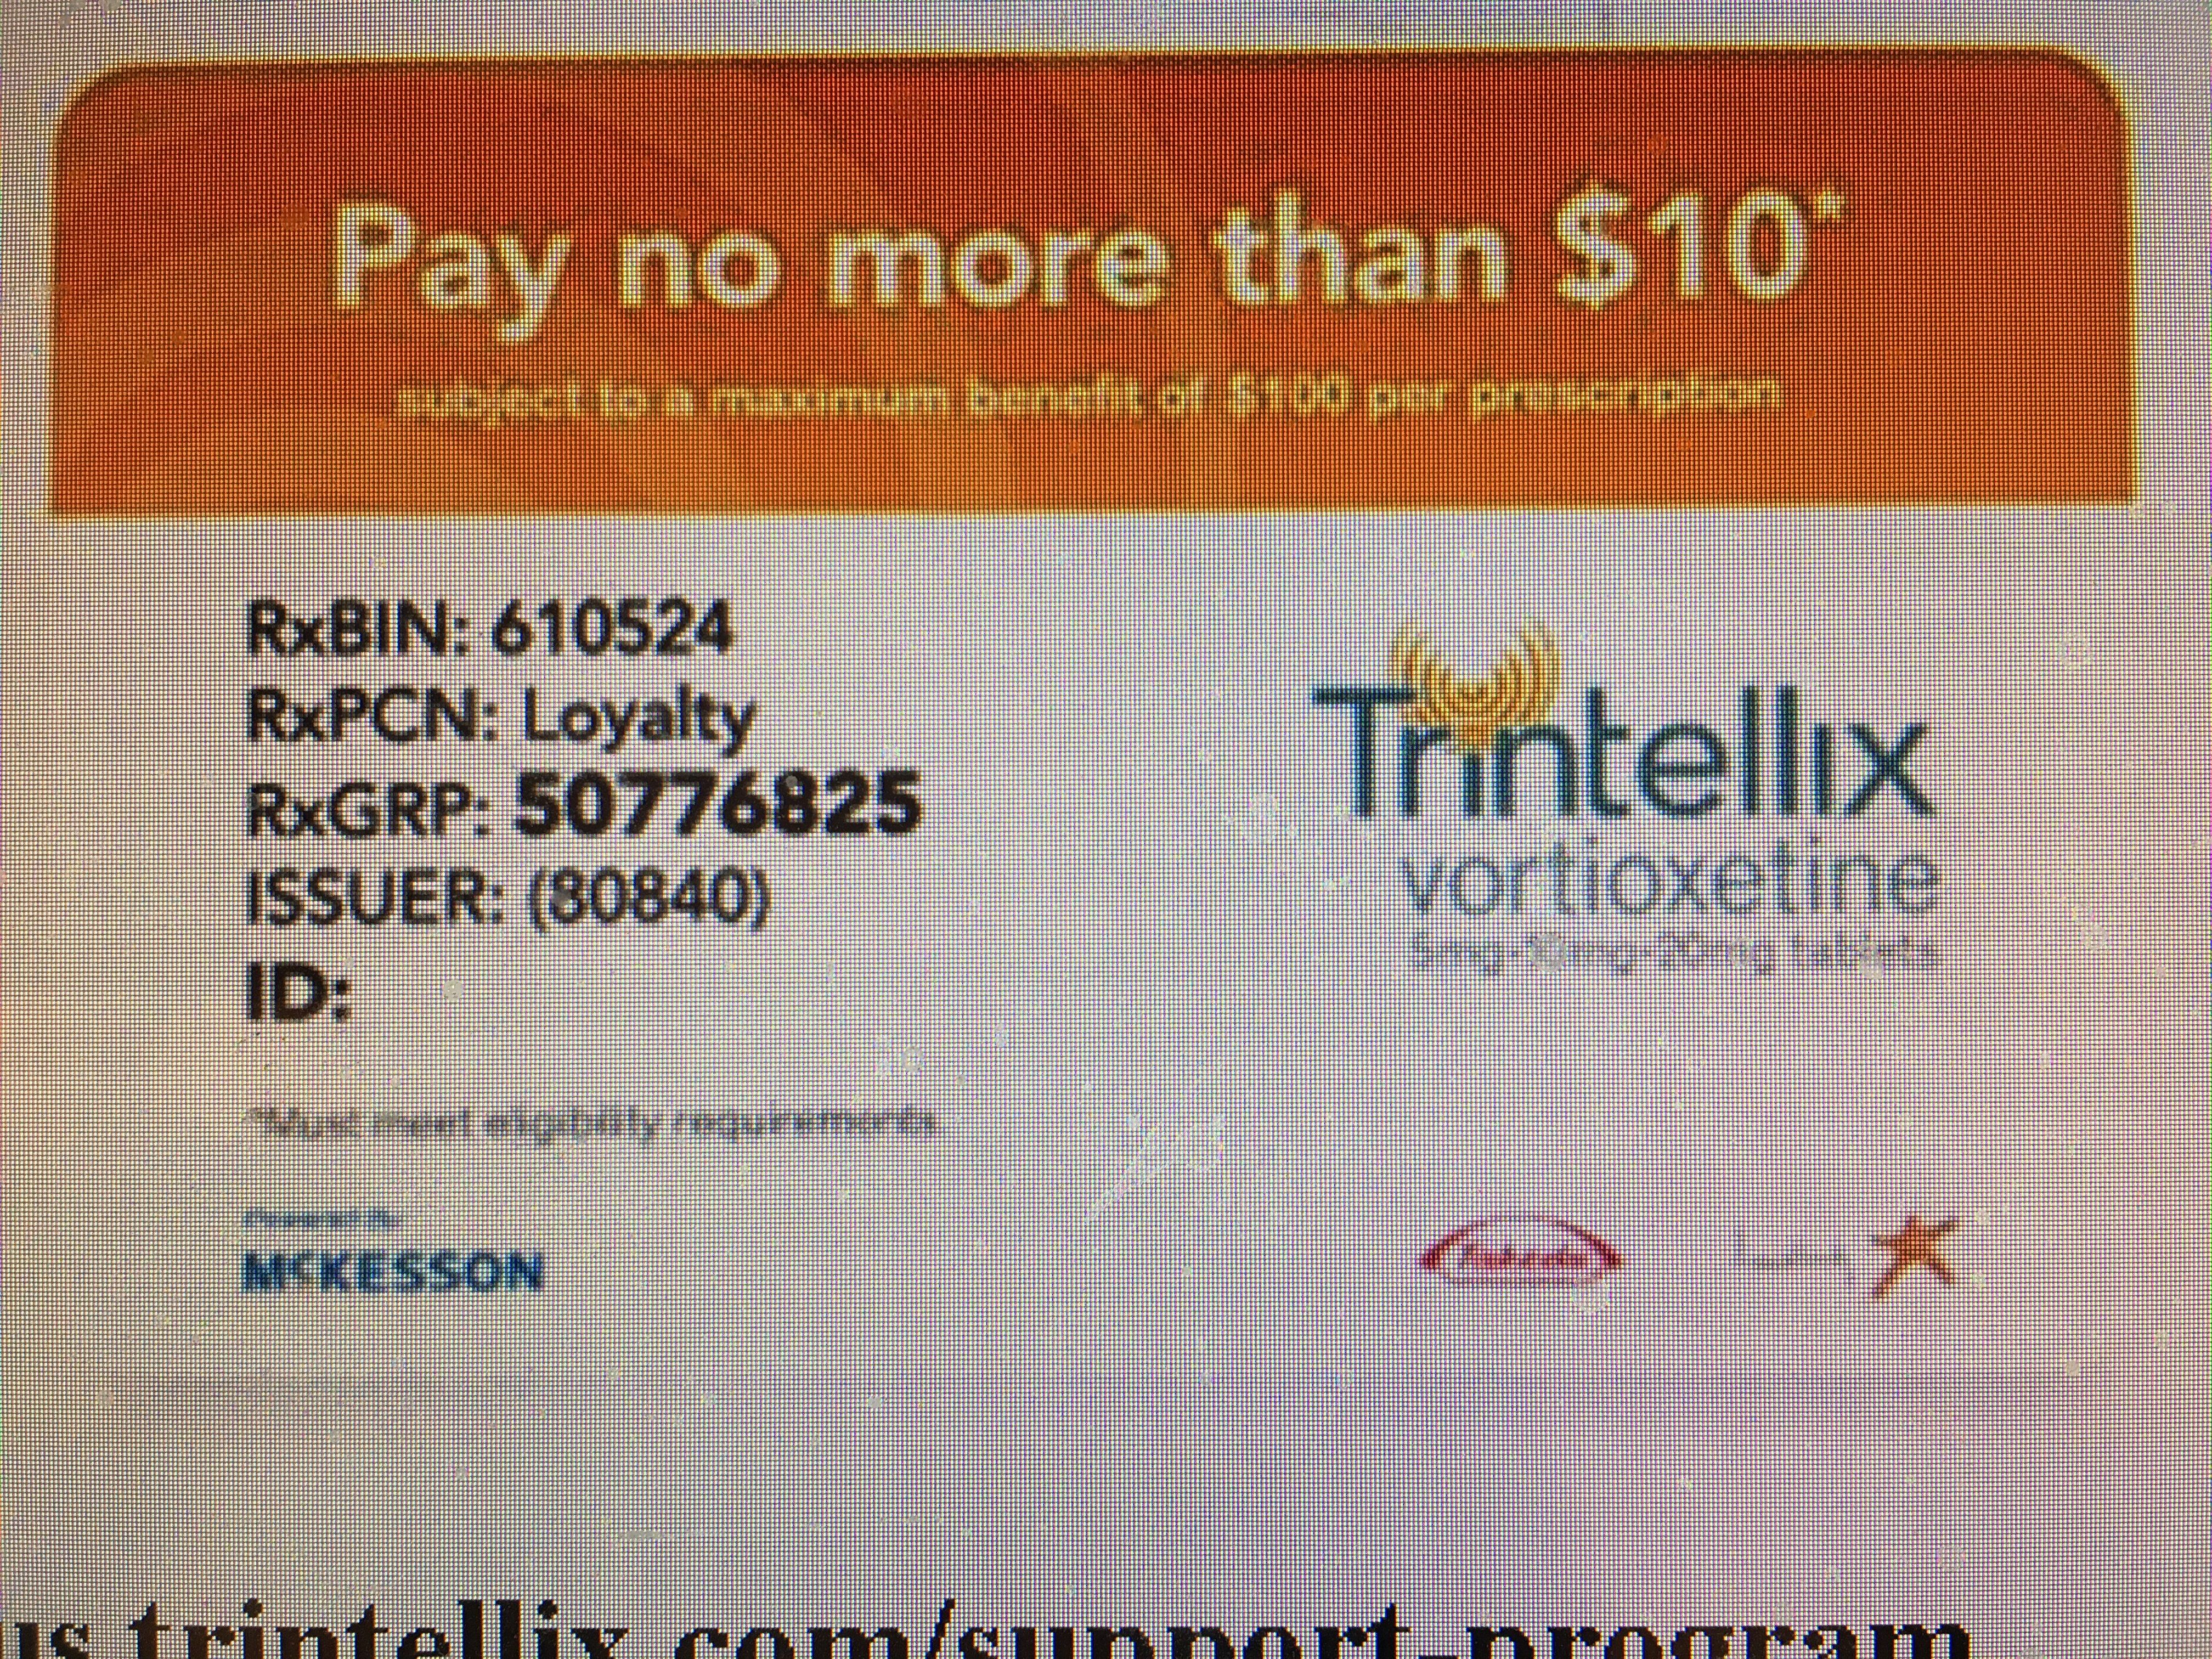 Trintellix - Pay No More Than $… | Drug Savings - Coupons And - Free Printable Spiriva Coupons